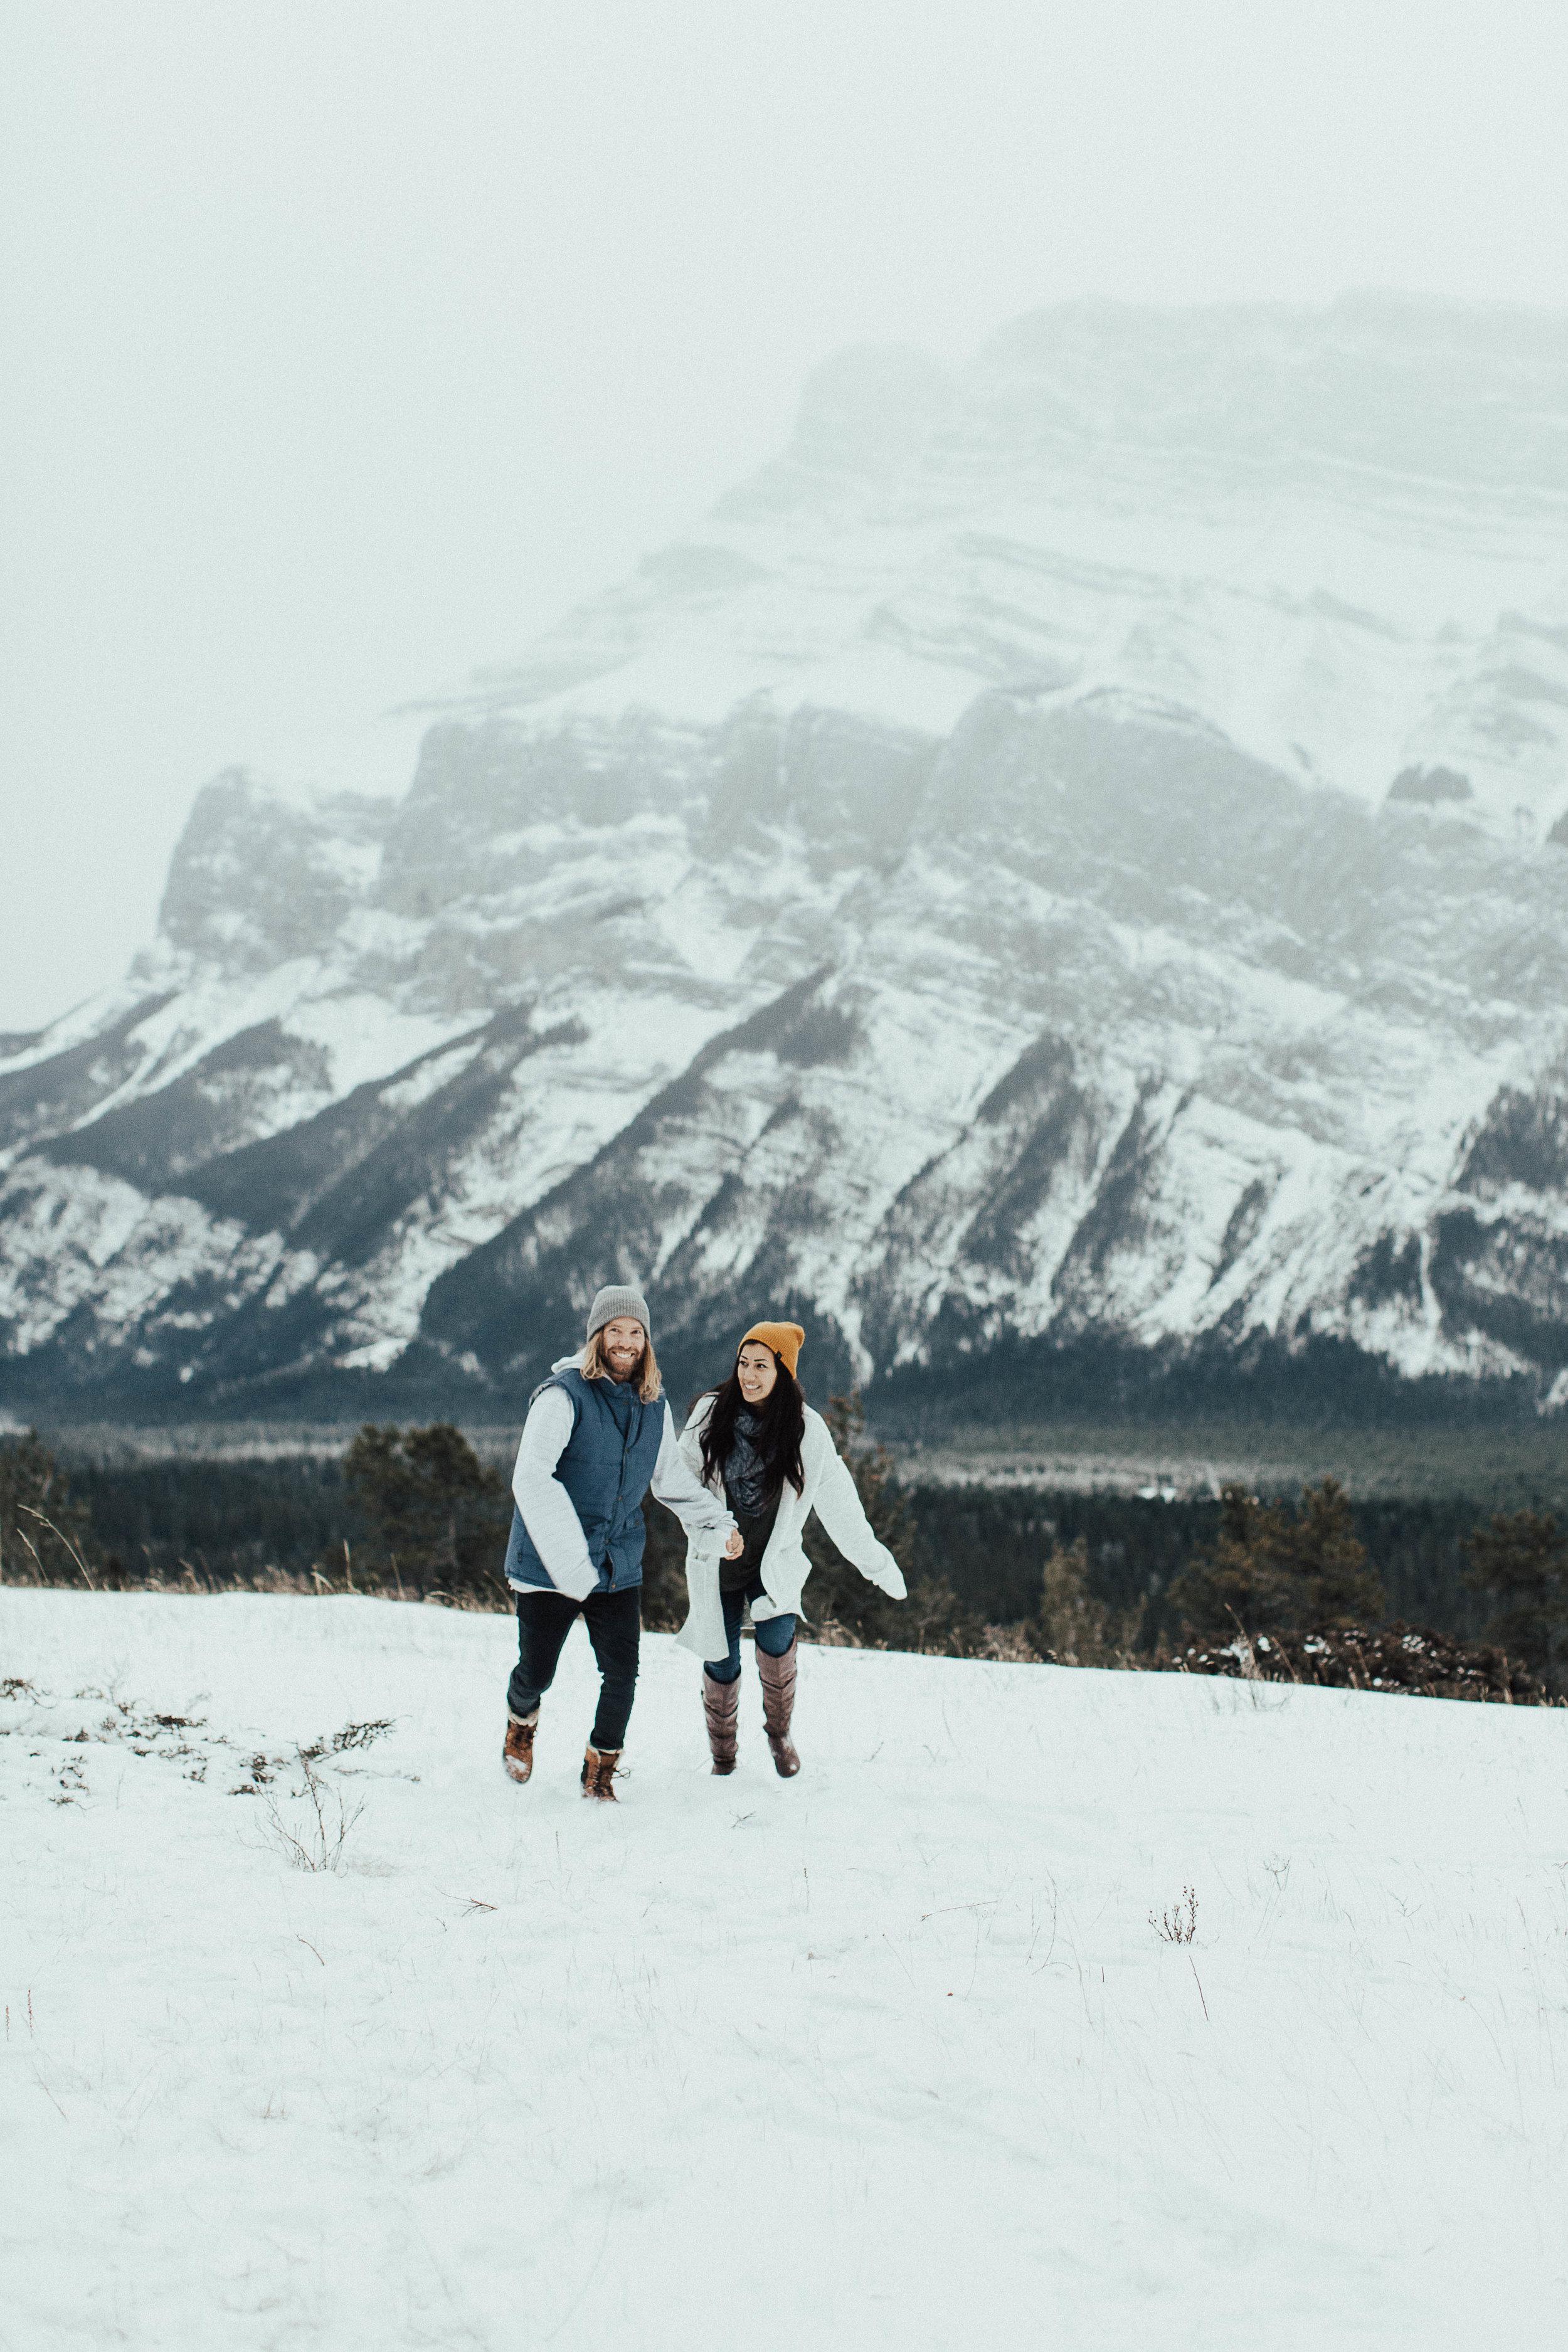 Banff Engagement Photographer - Winter Mountain Adventure Engagement Session - Michelle Larmand Photography-010